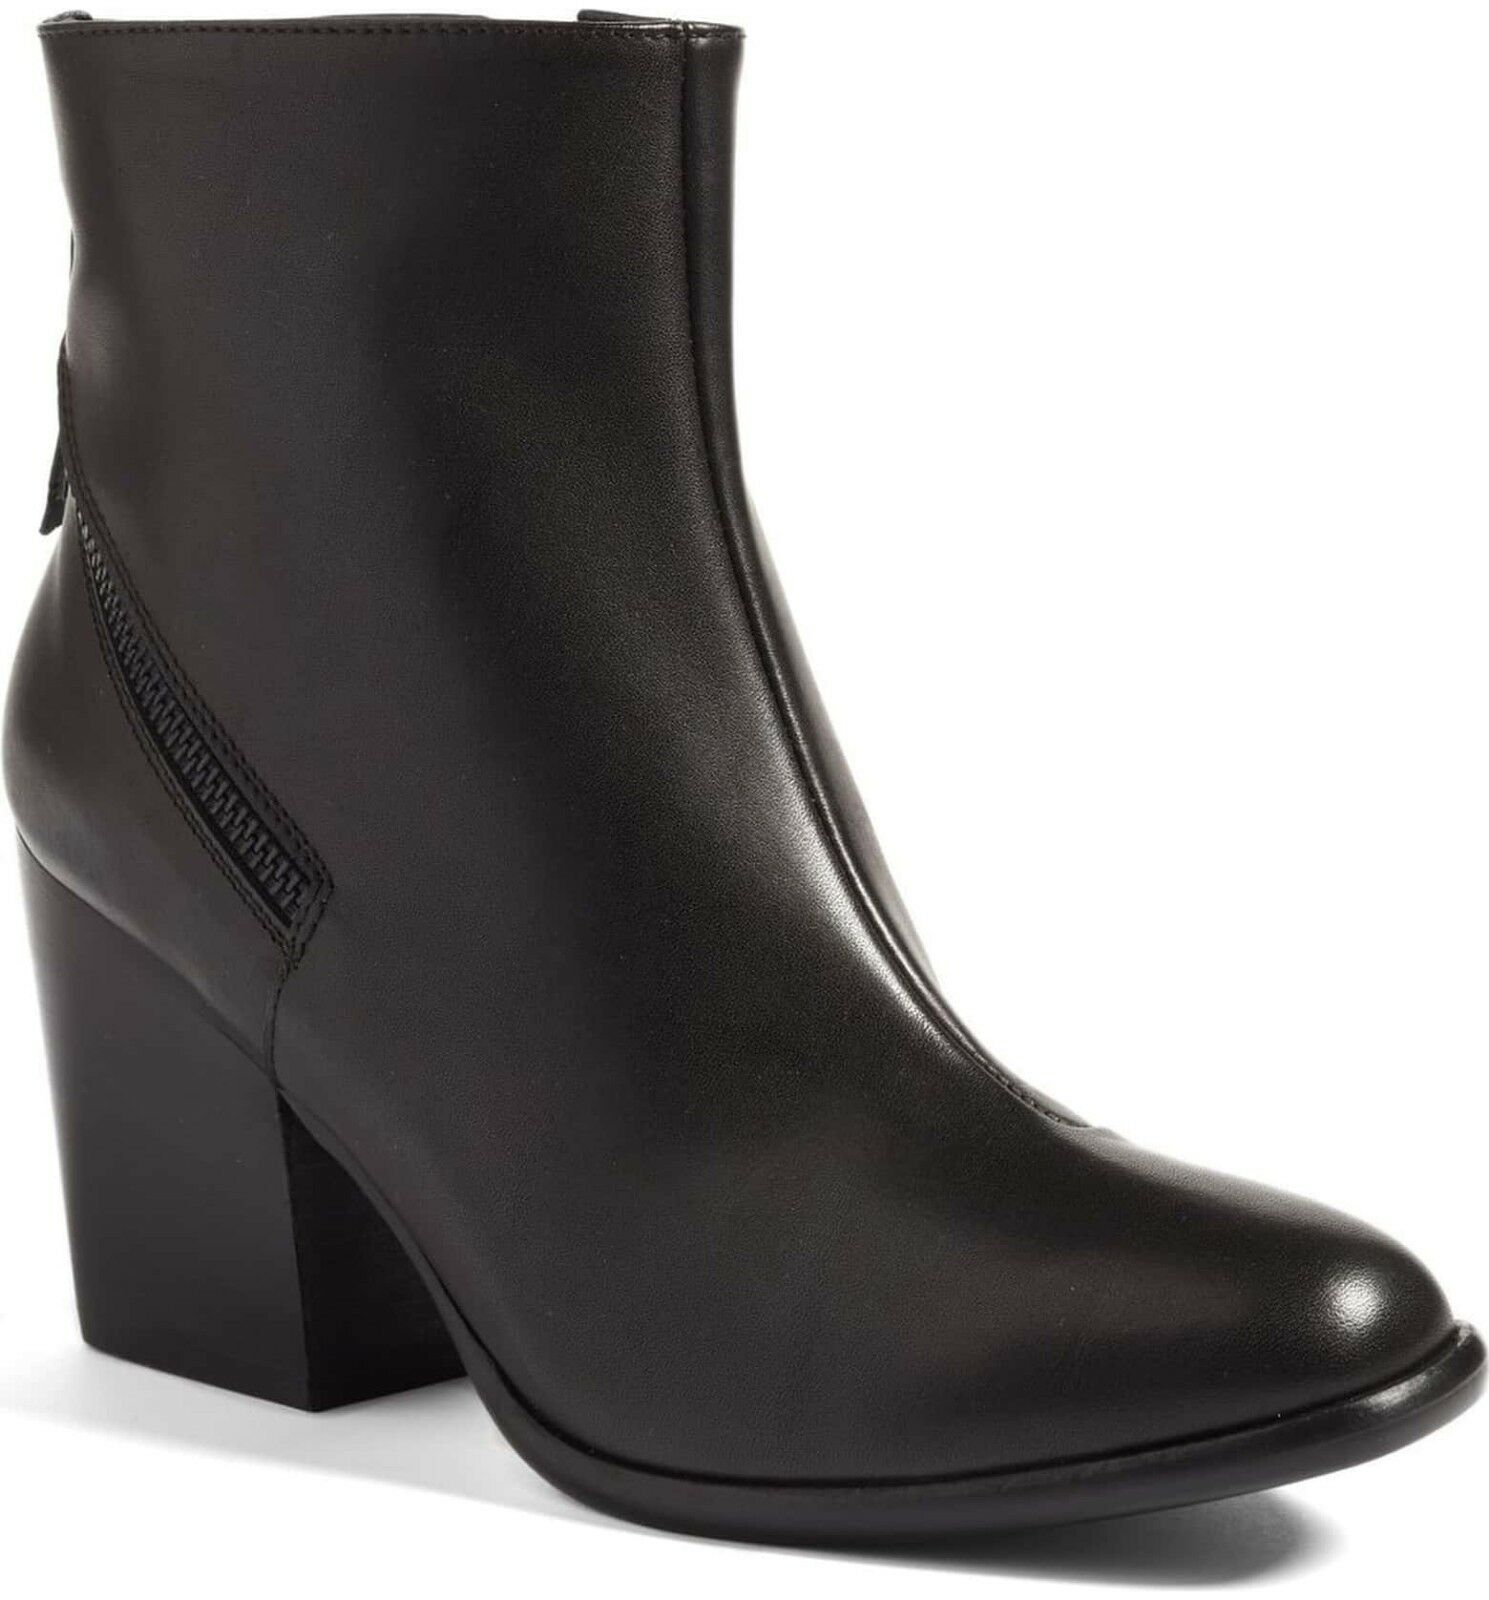 Womens Alberto Fermani Boots Viva Black Leather Ankle Booties 39.5 EU 9.5  485